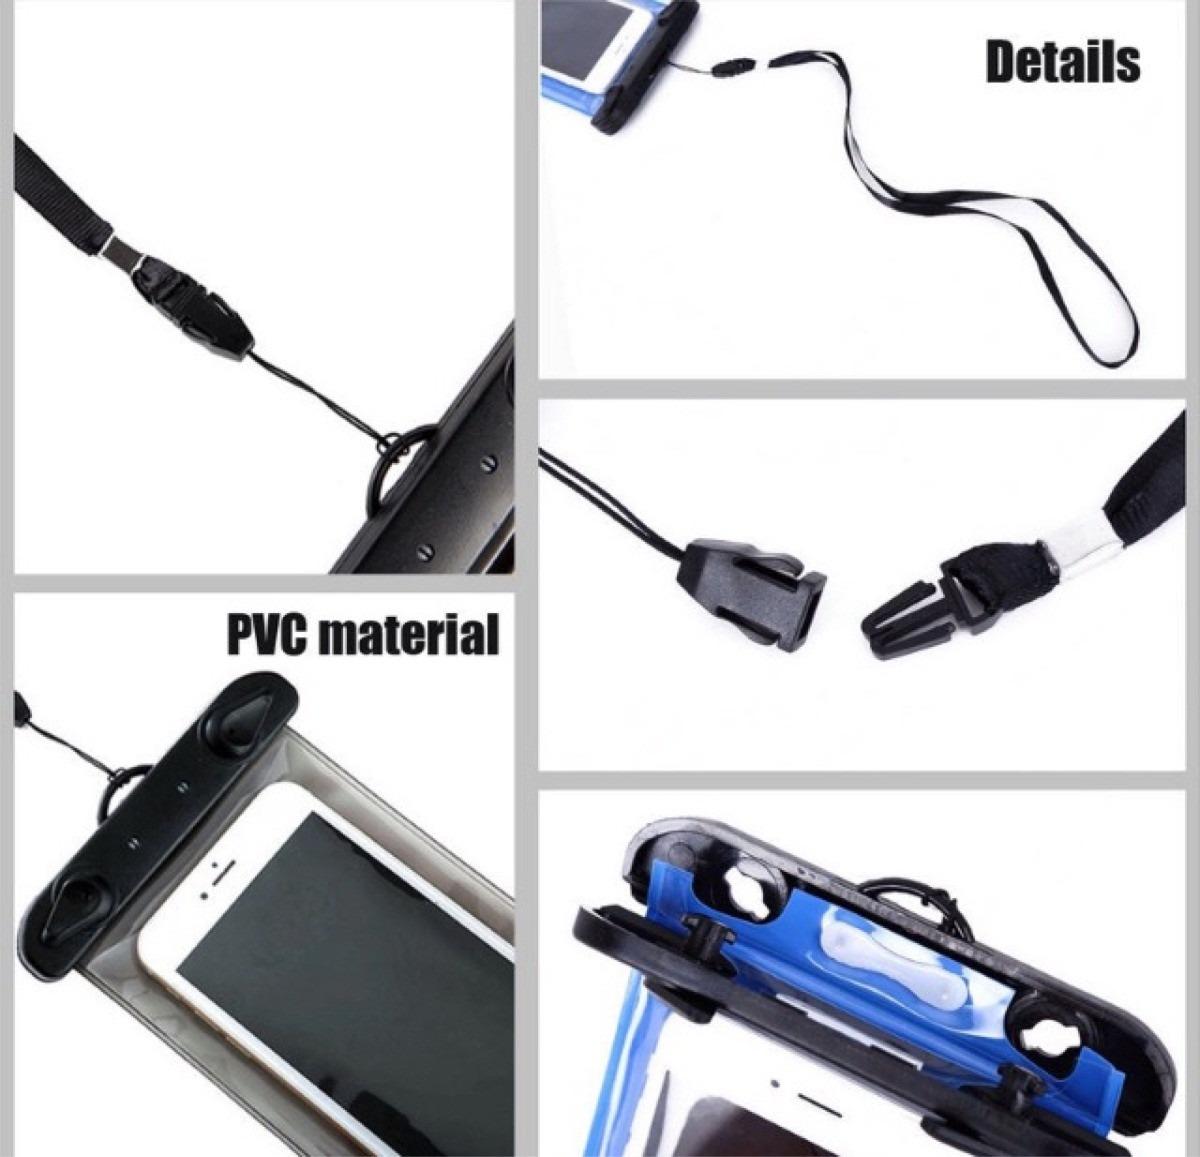 d588ce19999 funda acuatica p/ celulares iphone 5 5s iphone 6 6s iphone 4. Cargando zoom.